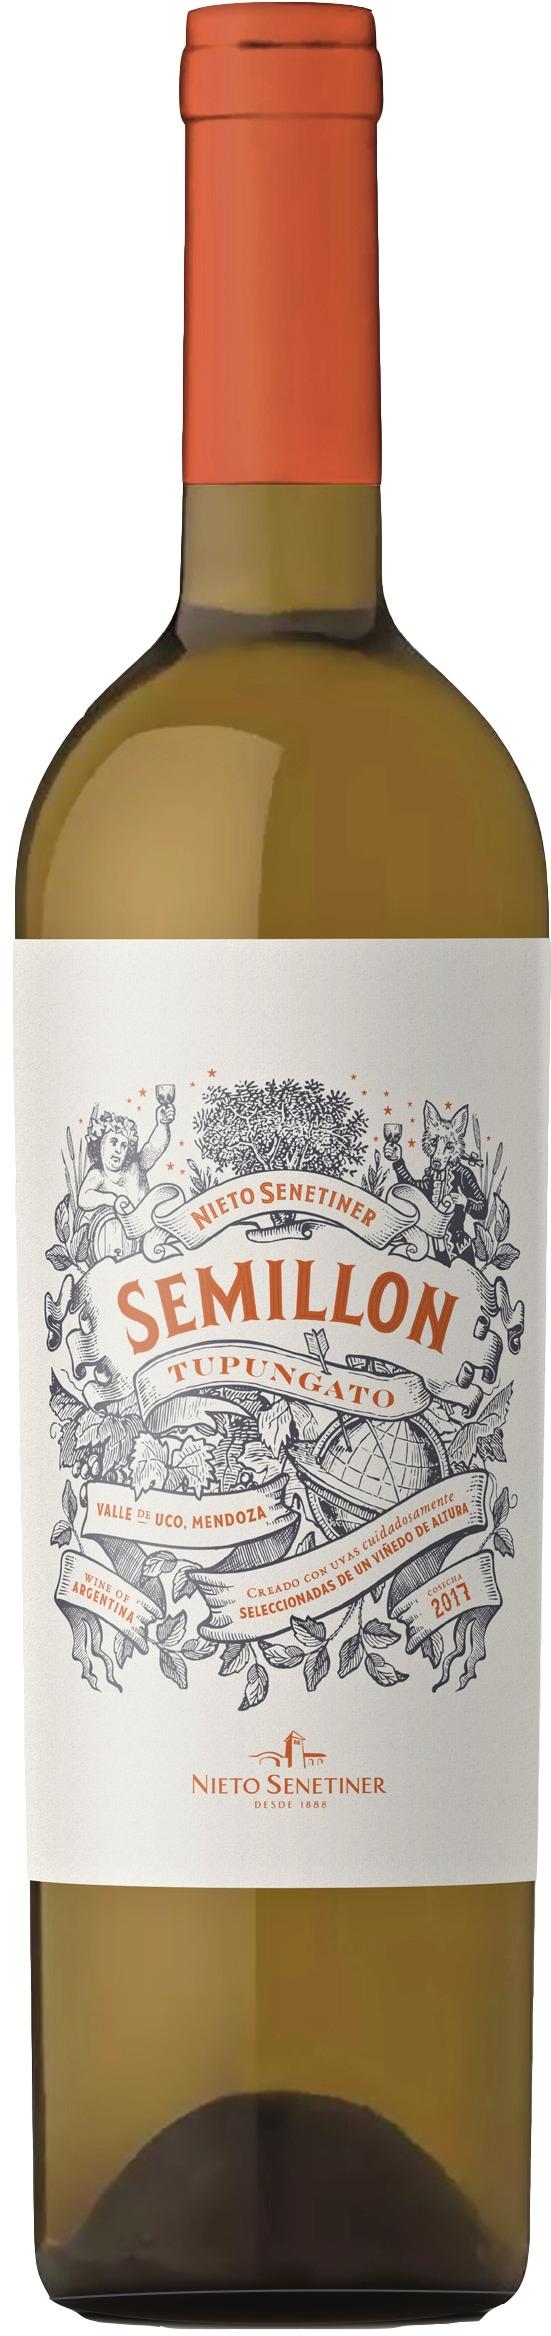 Caudalia wine Box February 2020 Semillon Argentina Nieto Senetiner